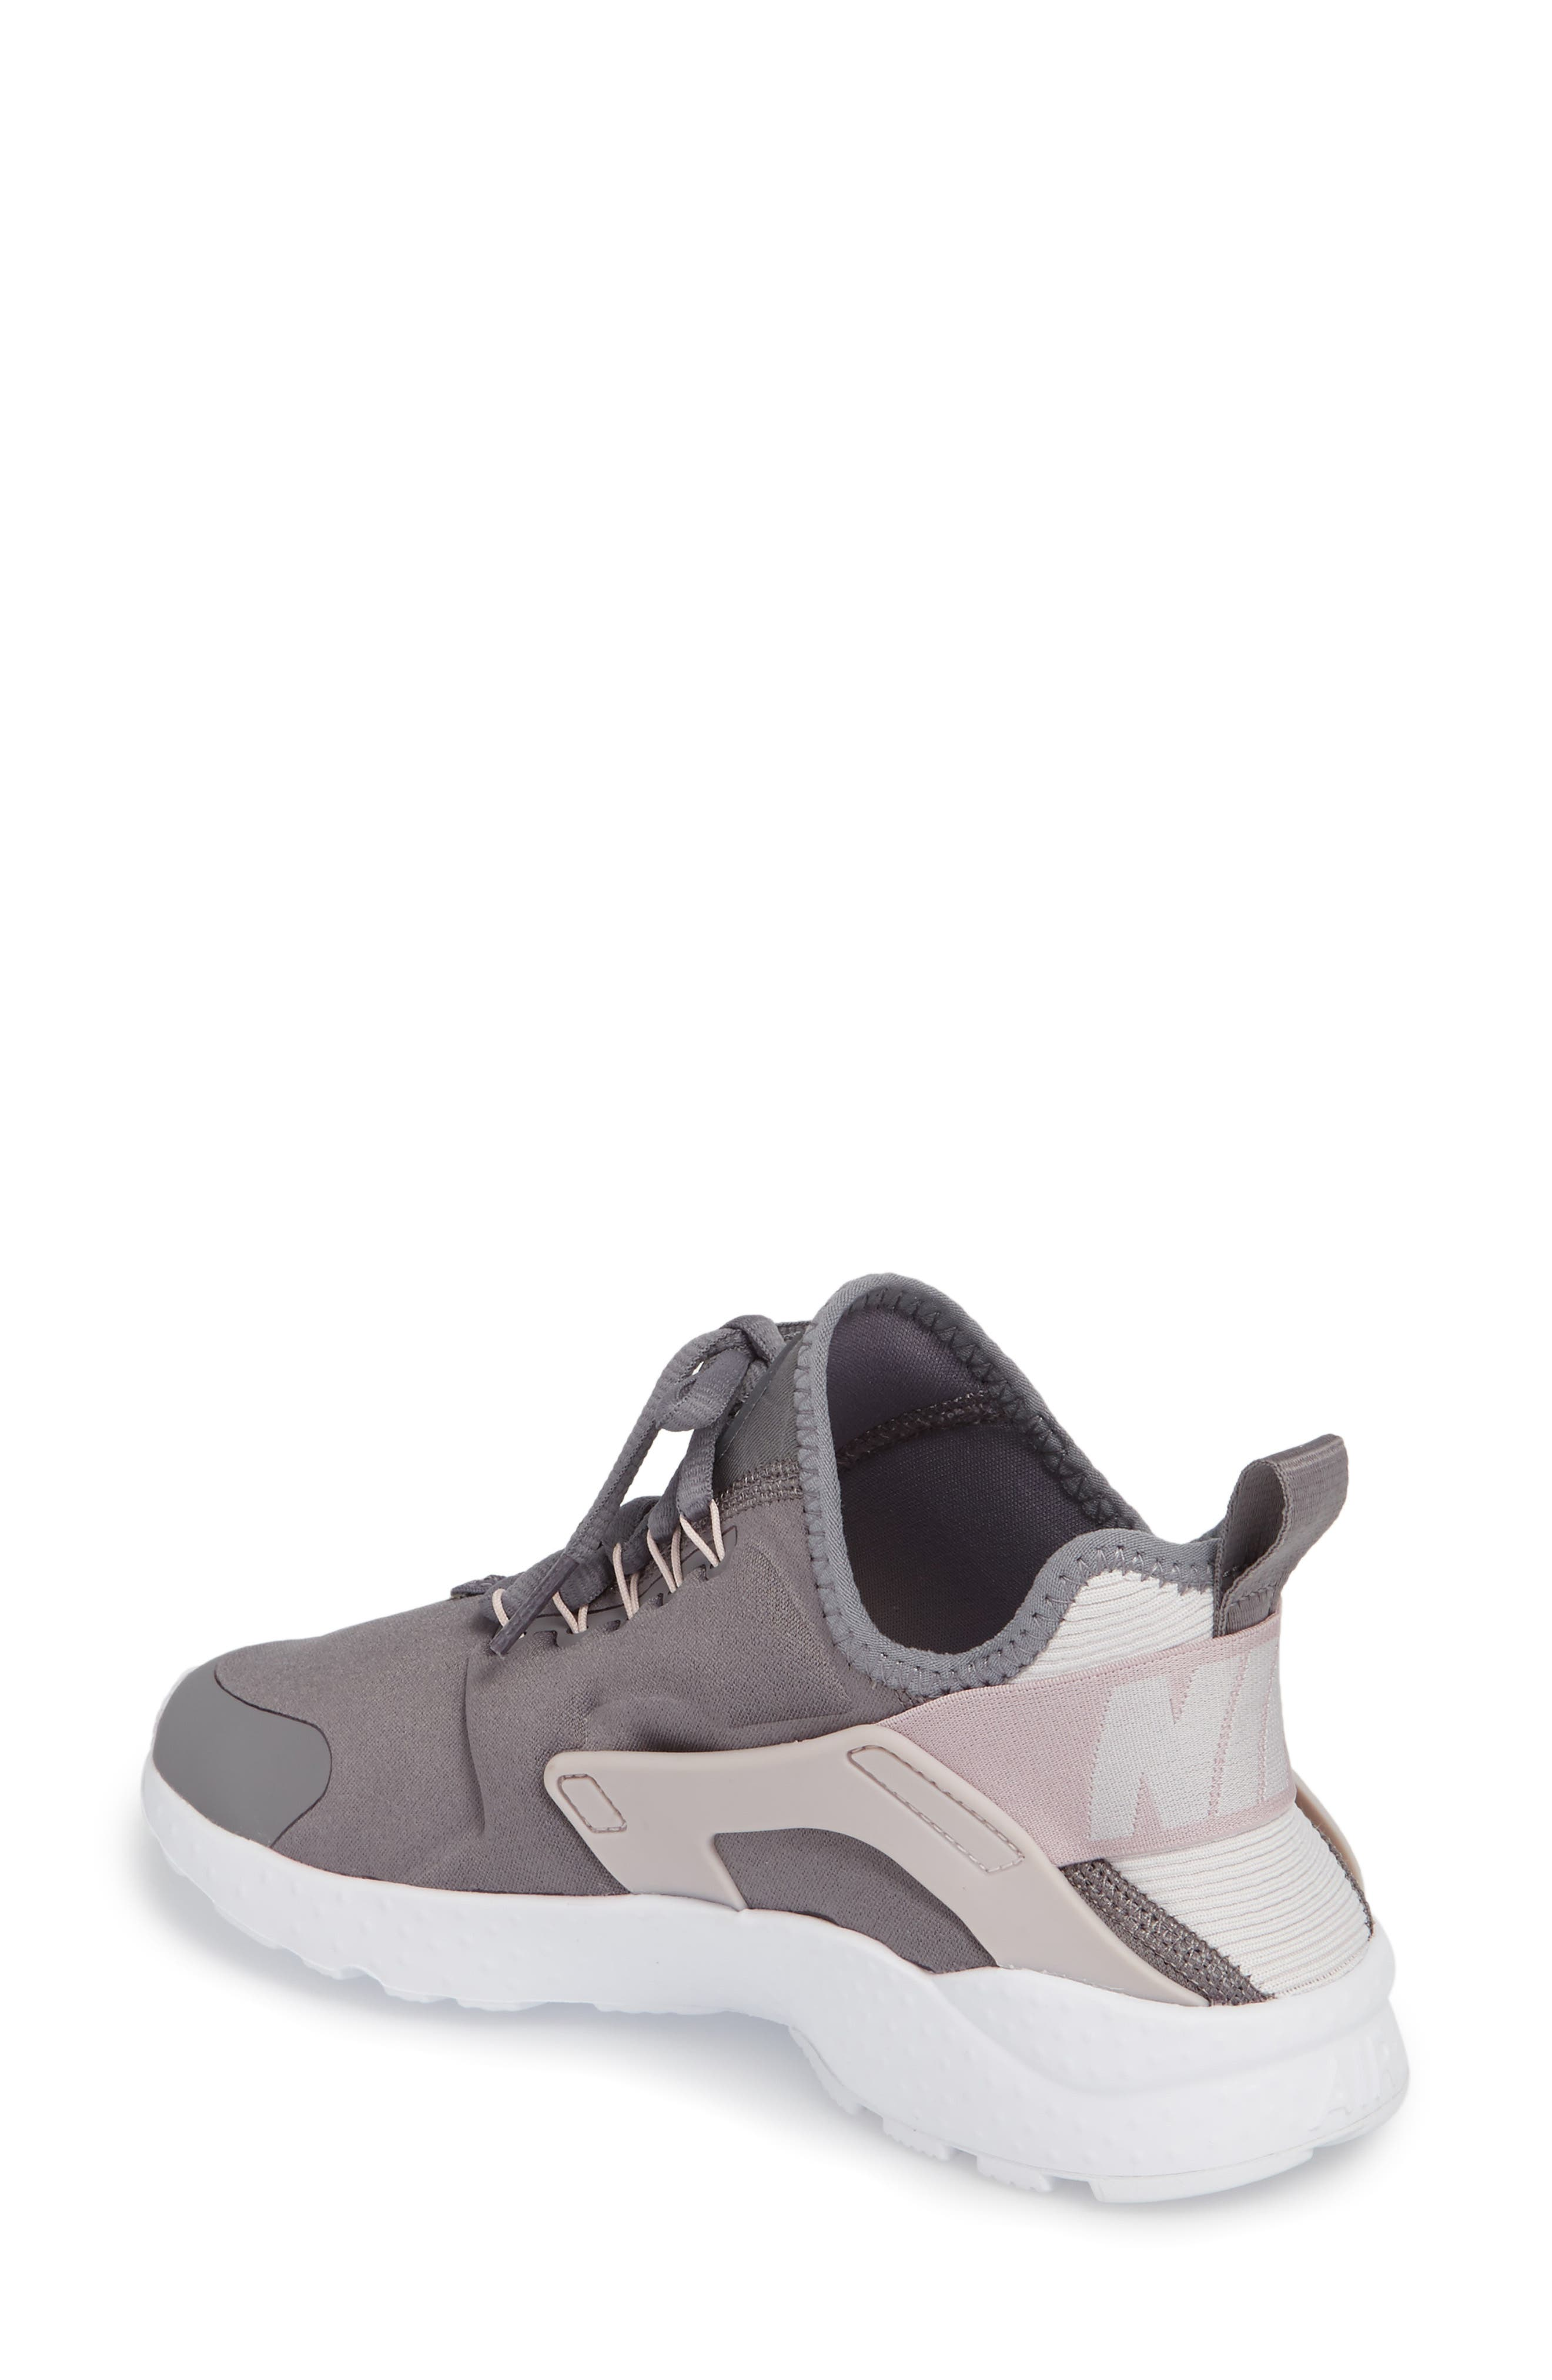 Air Huarache Sneaker,                             Alternate thumbnail 2, color,                             026